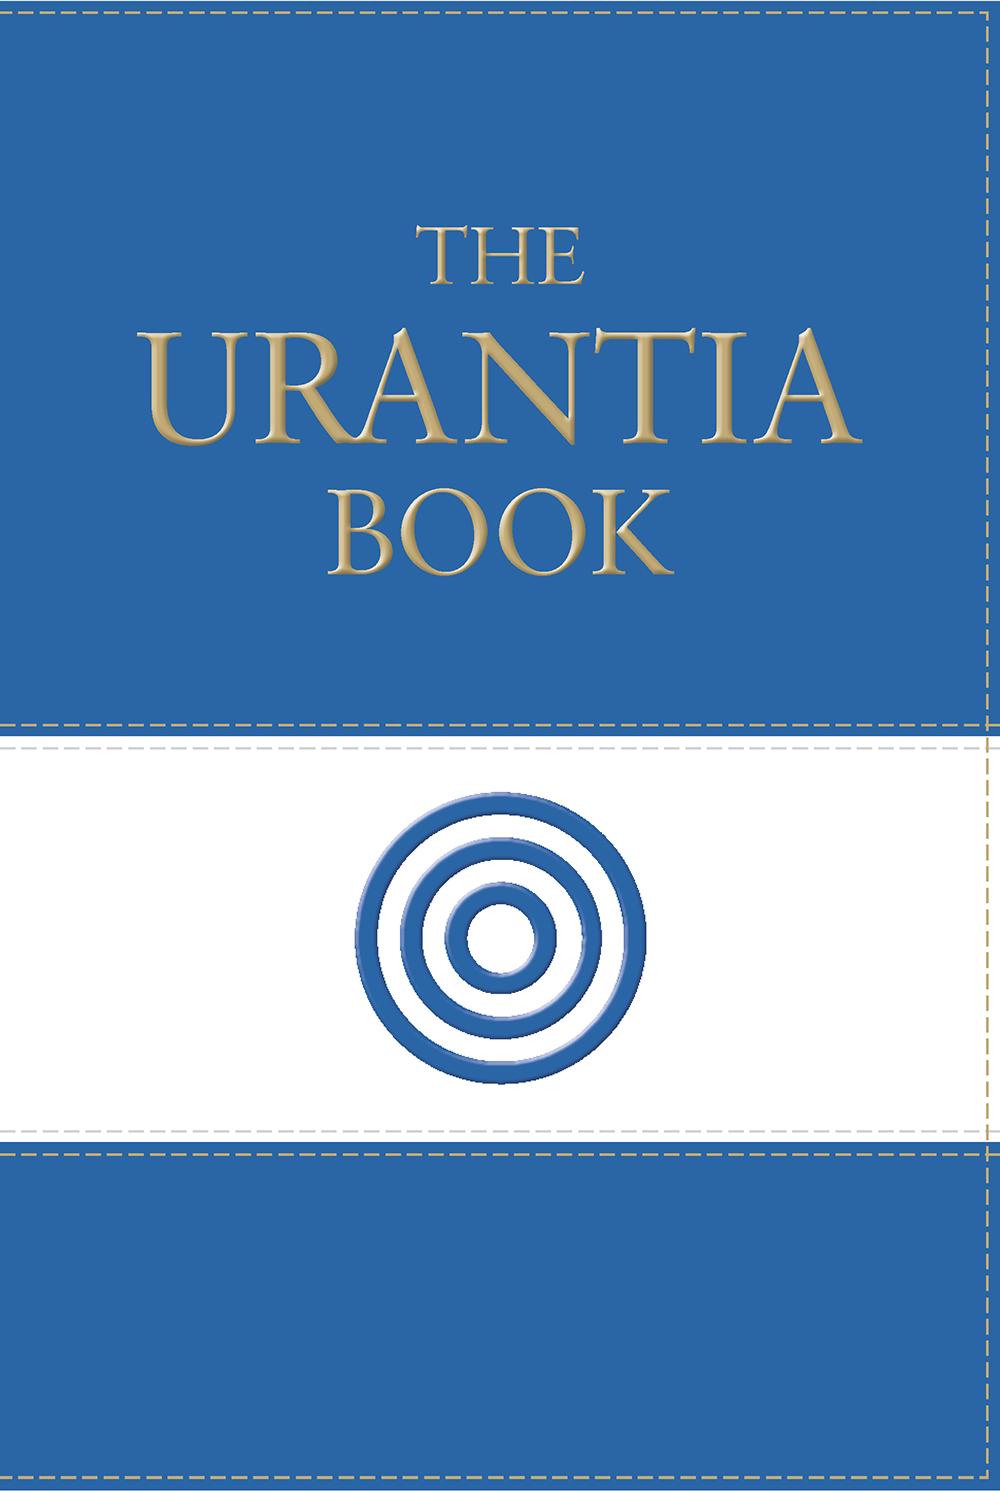 2011 The Urantia Book - Boxed - Leather - White Stripe